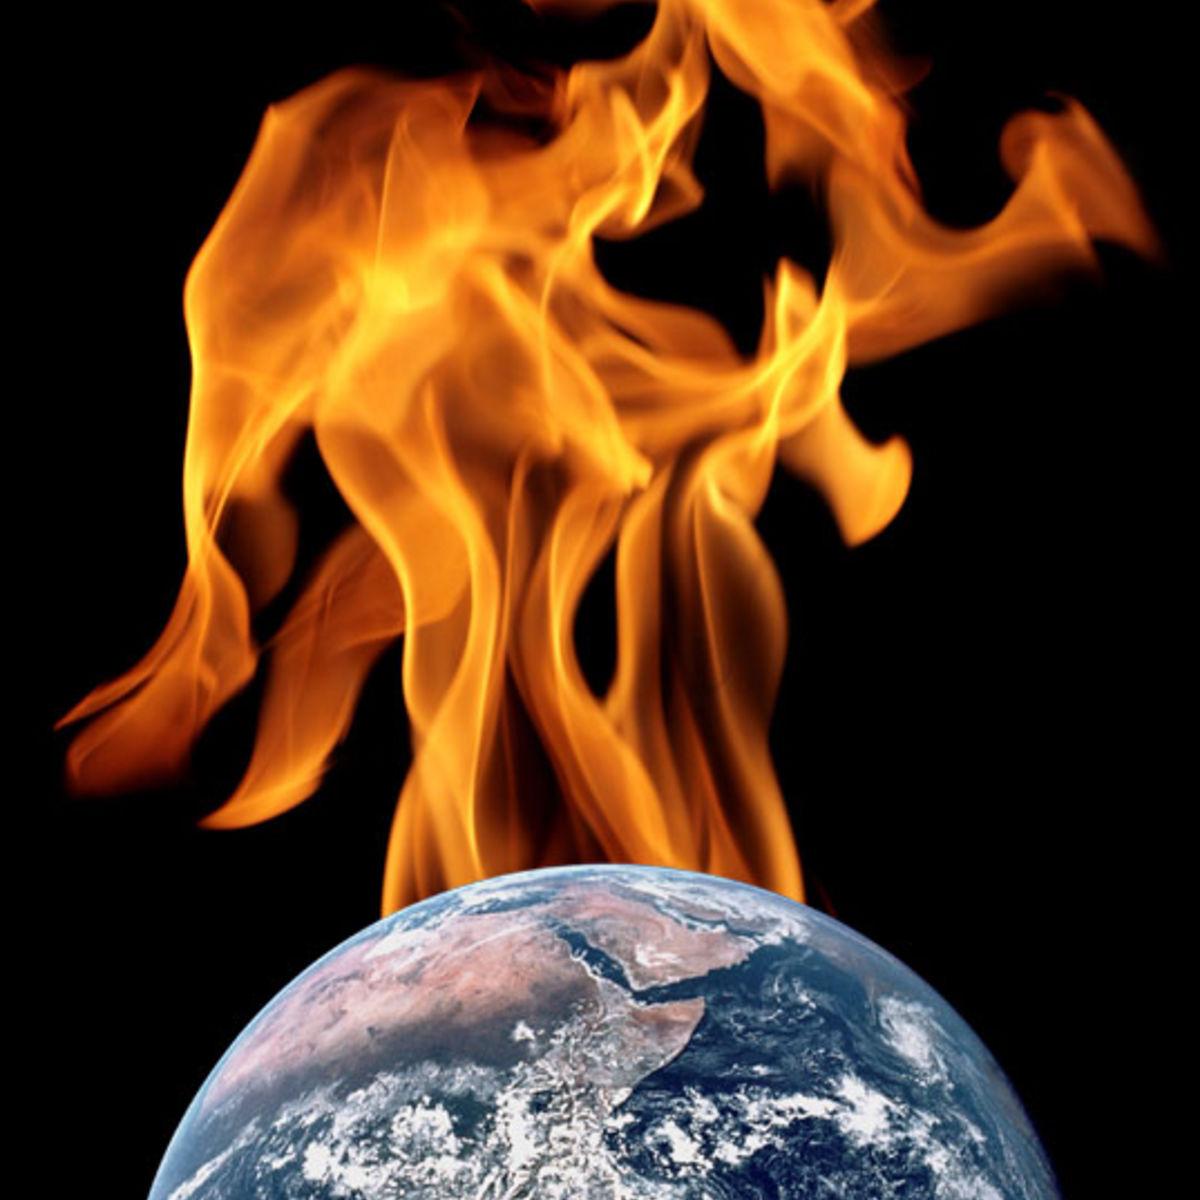 earthonfire_11.jpg